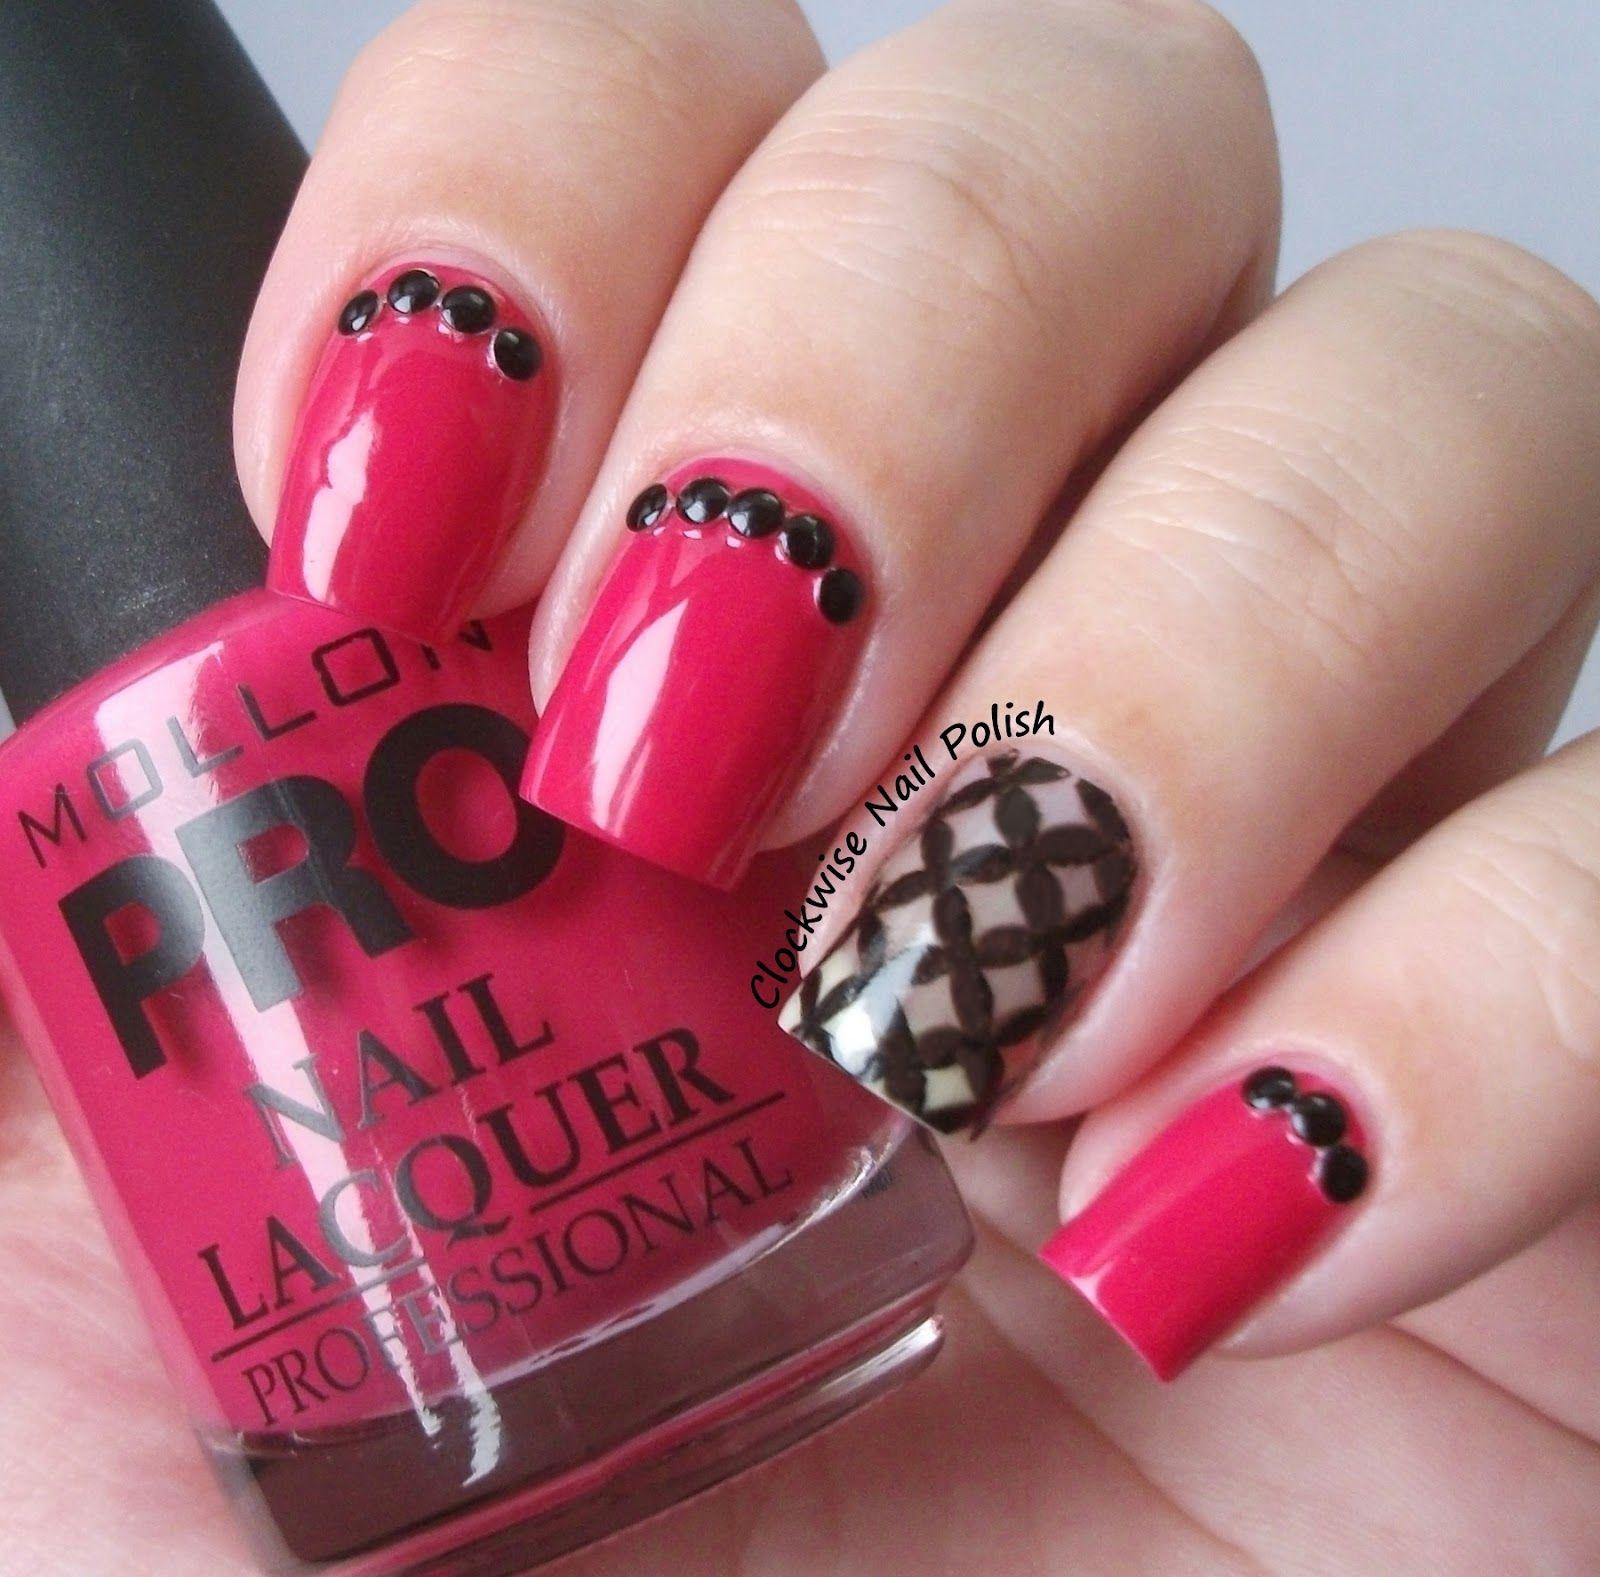 The Clockwise Nail Polish: Mollon Pro 196 Pink Quartz Review   Nails ...